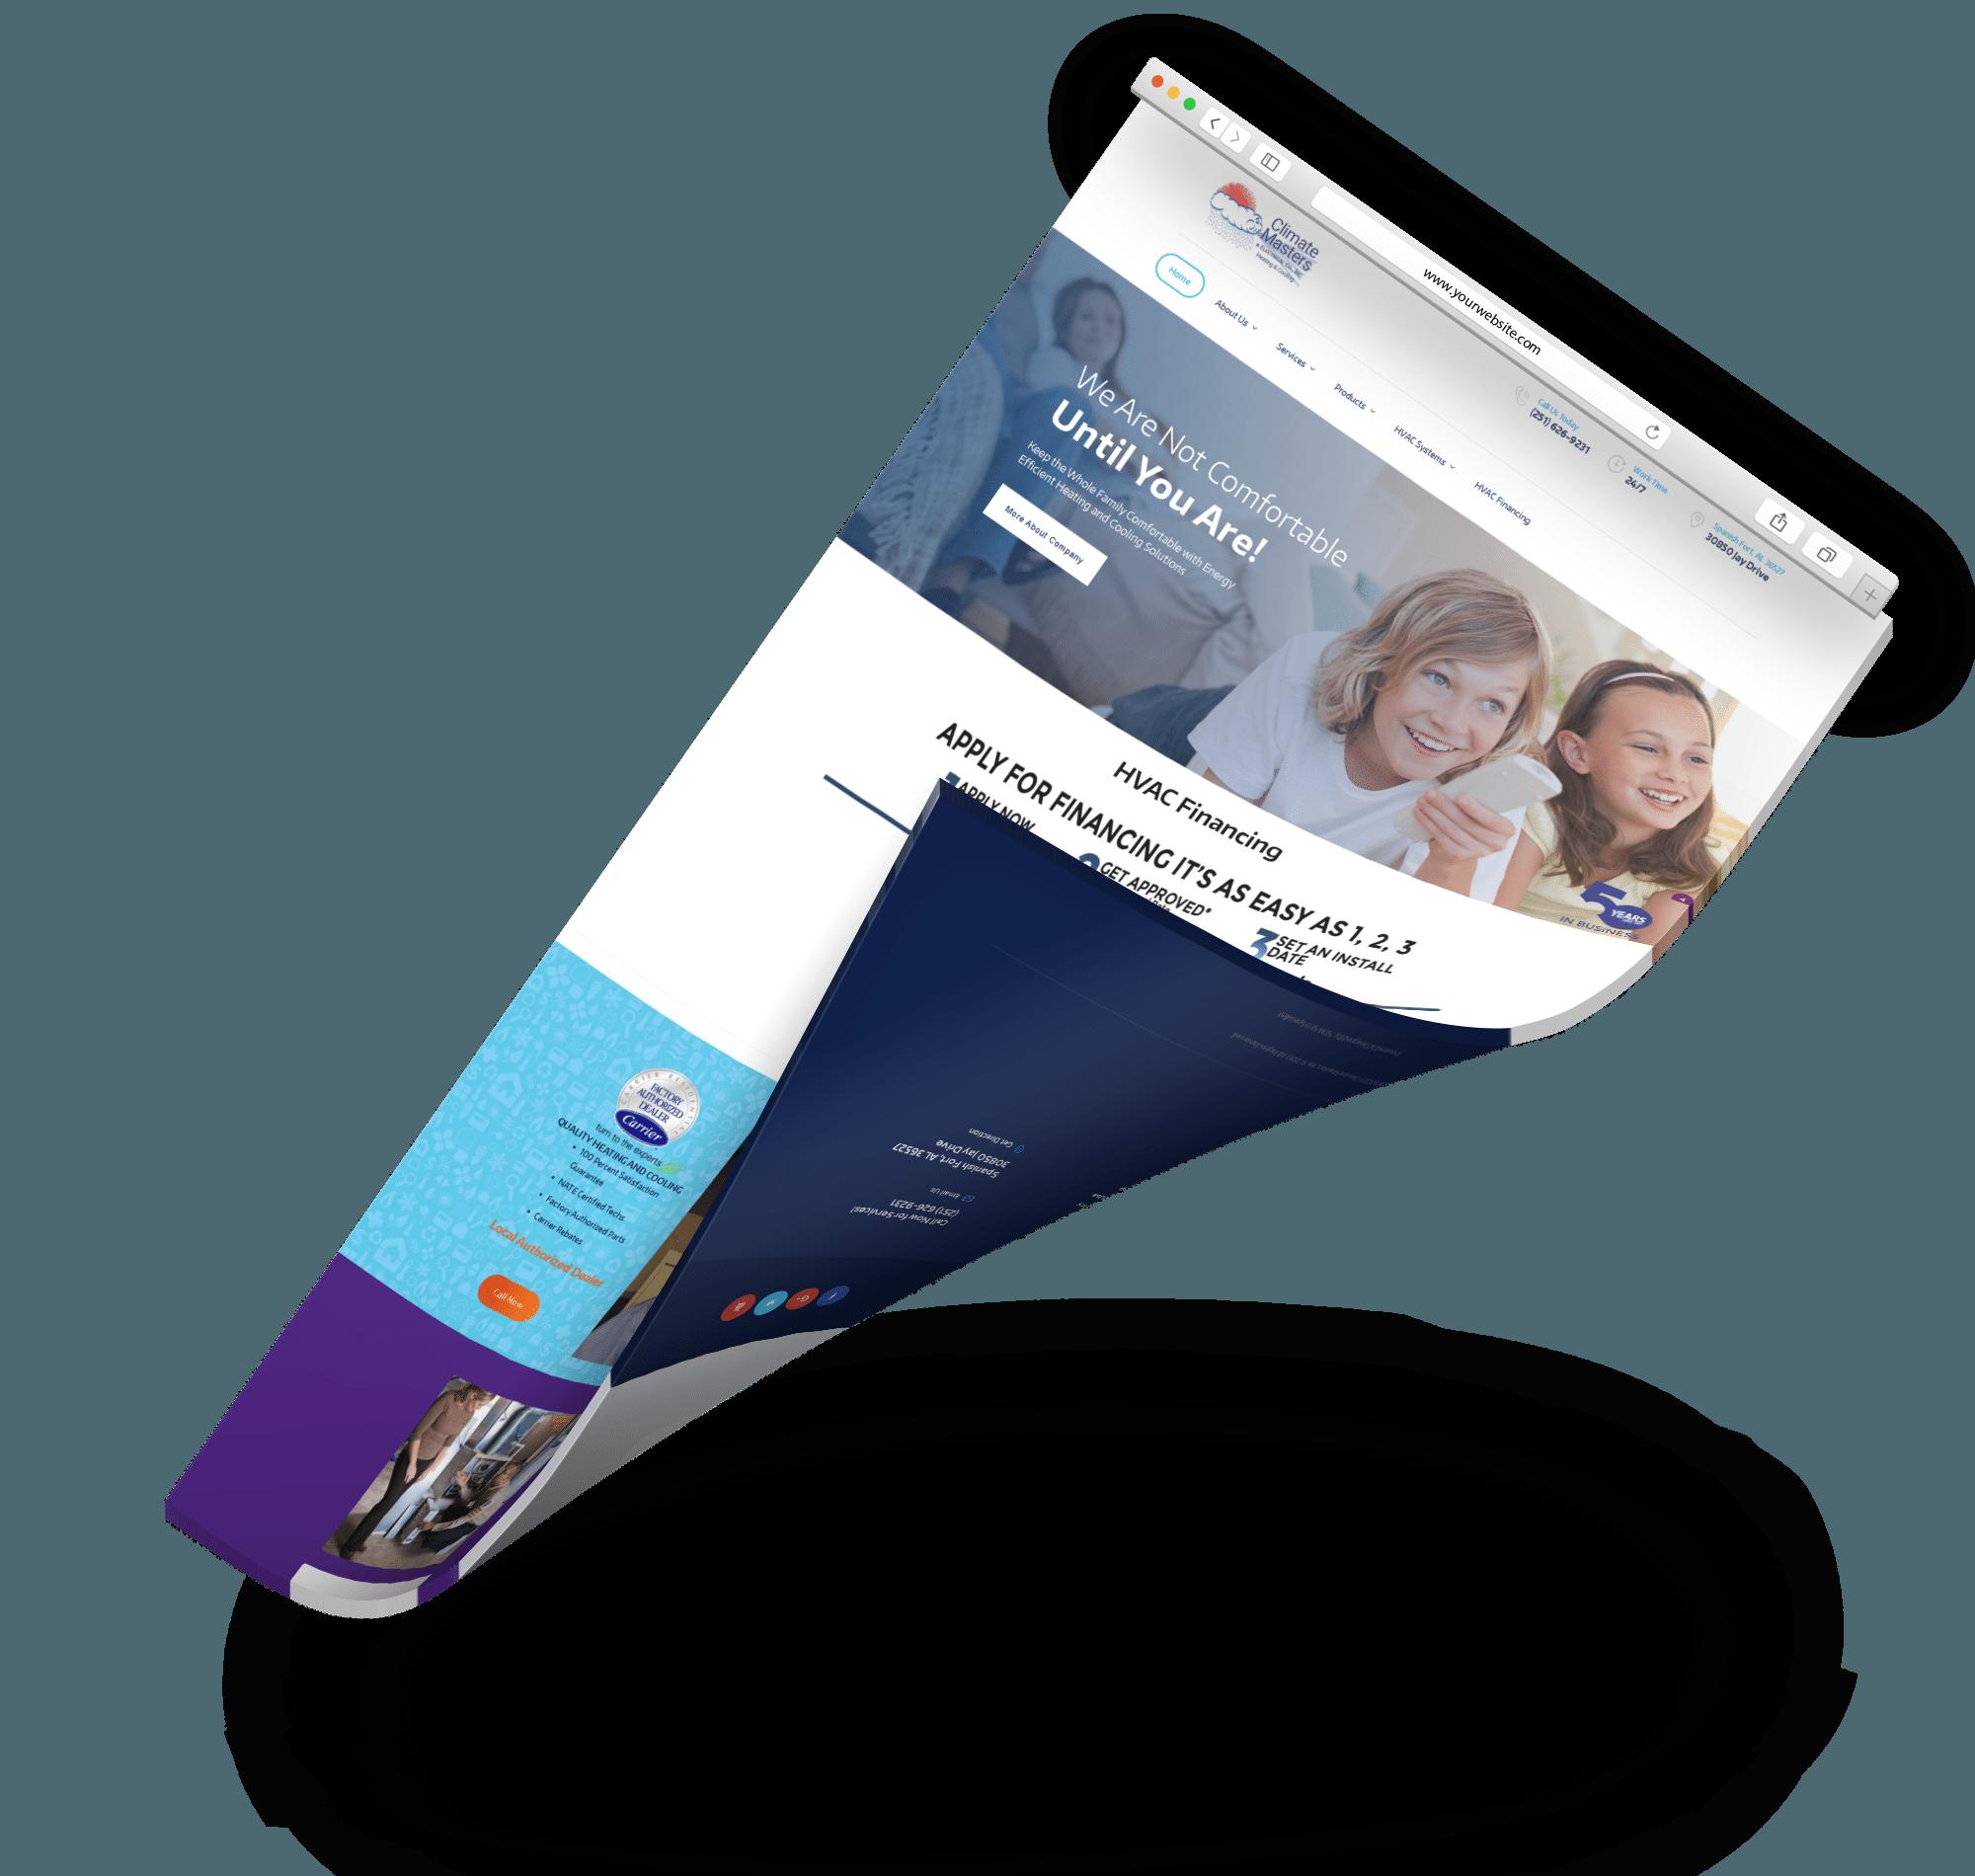 climate master web design service sem seo specialist